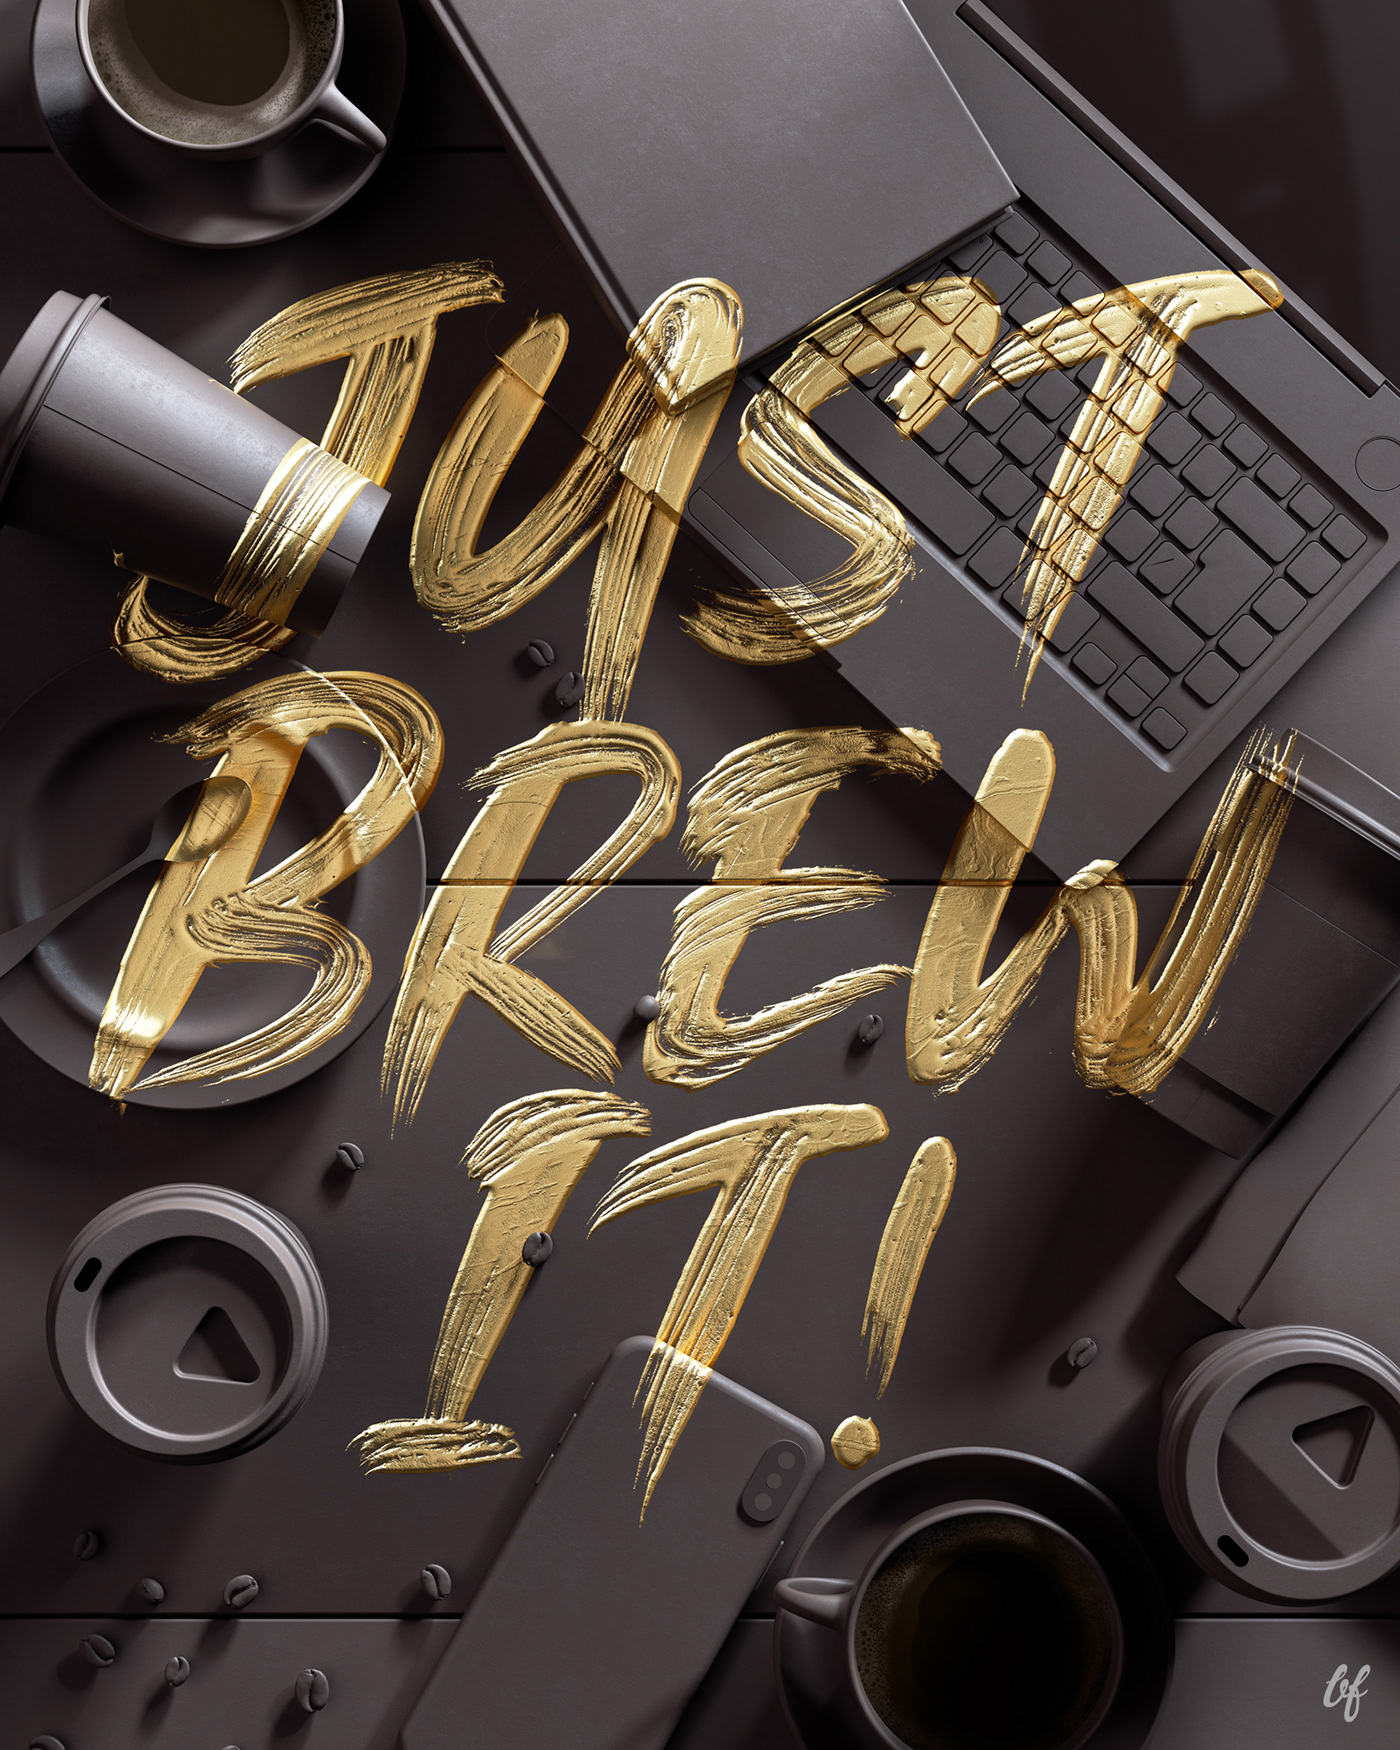 3D,art,CGI,cinema4d,digital,lettering,octane,Render,type,typography